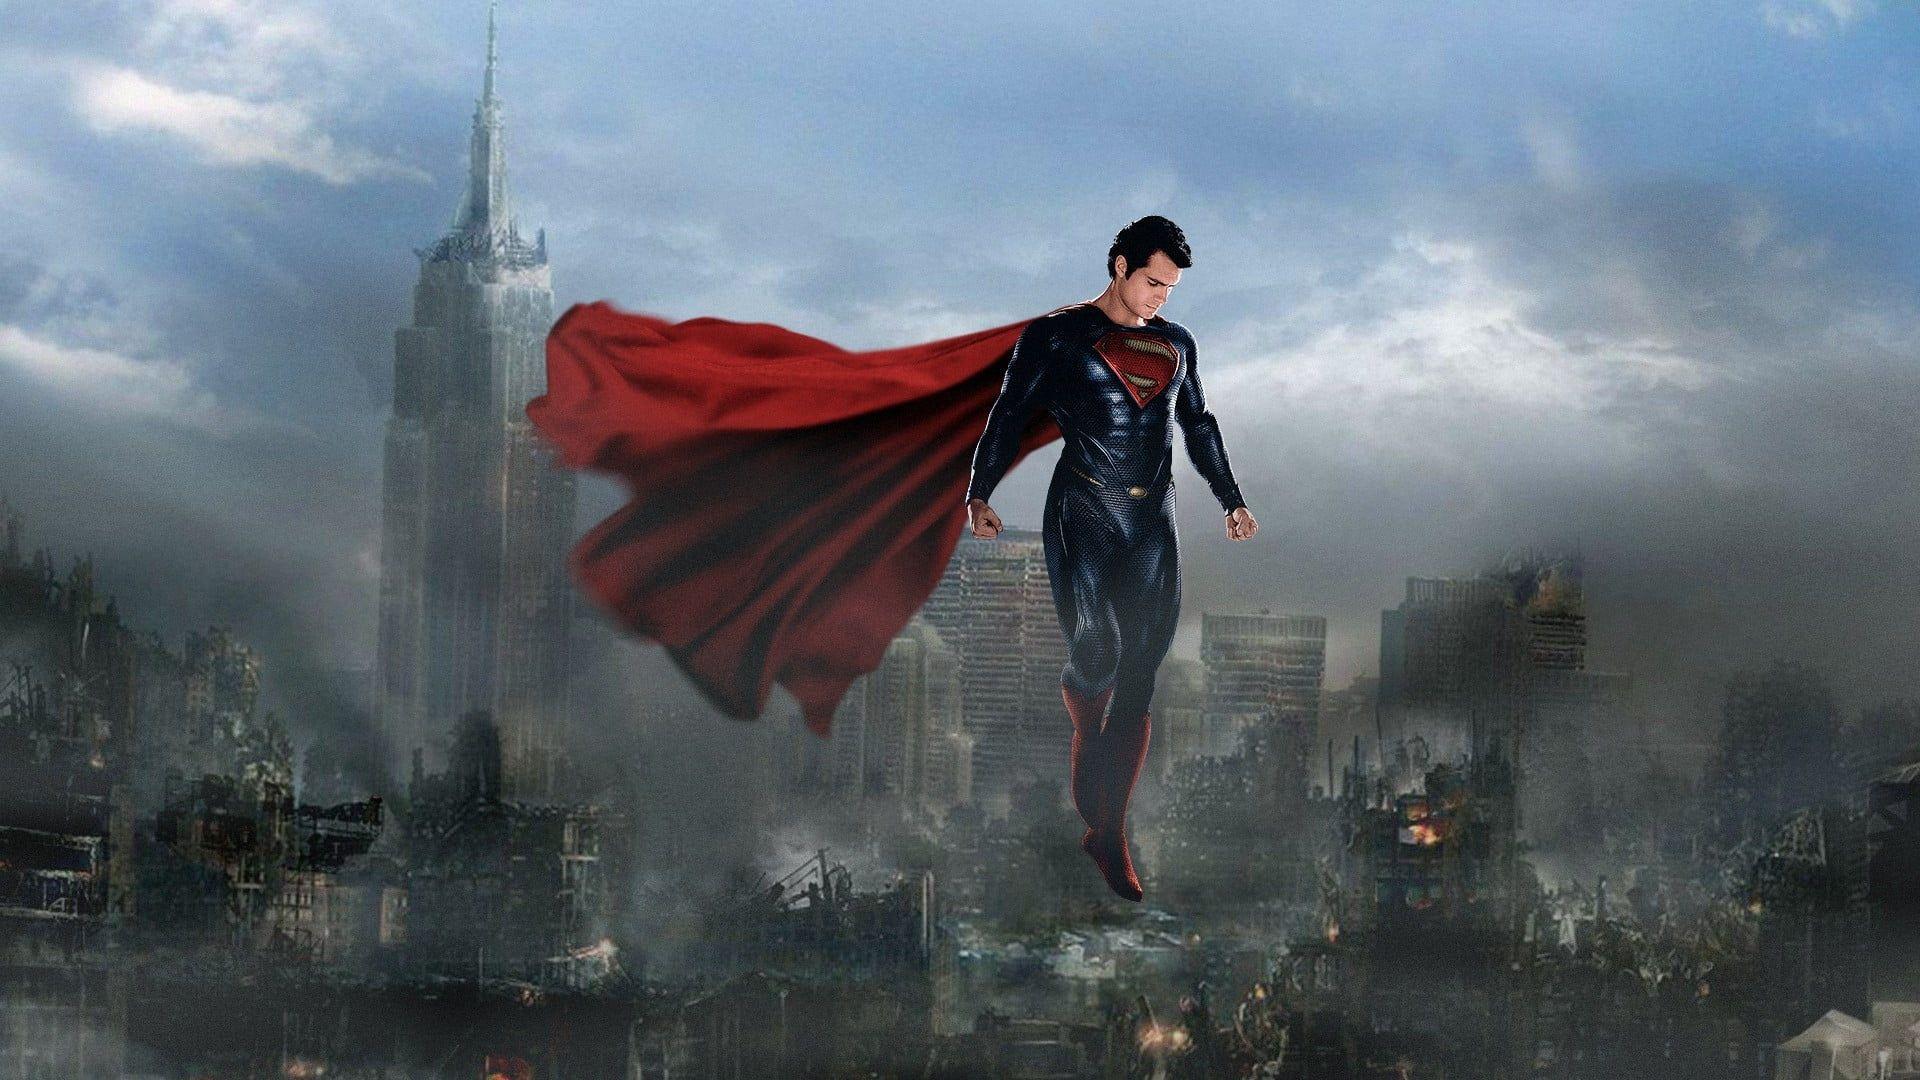 Superman Superman 1080P wallpaper hdwallpaper desktop